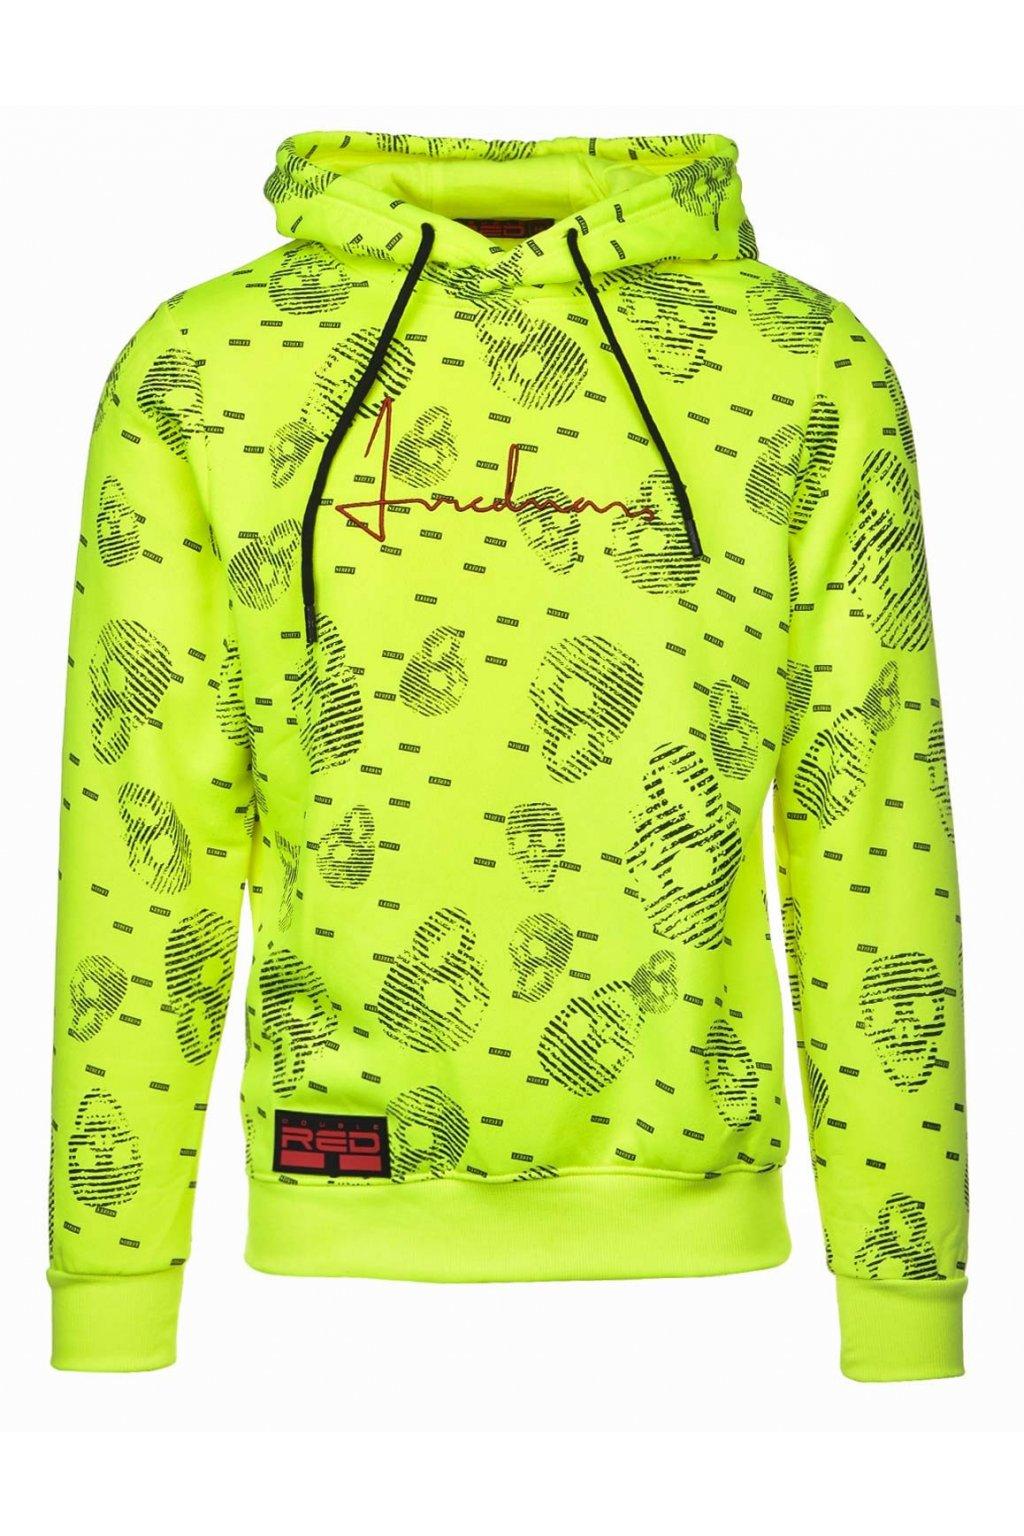 Double Red pánská mikina Hoodie I REDMAN Skull Street Edition Neon Yellow obr1